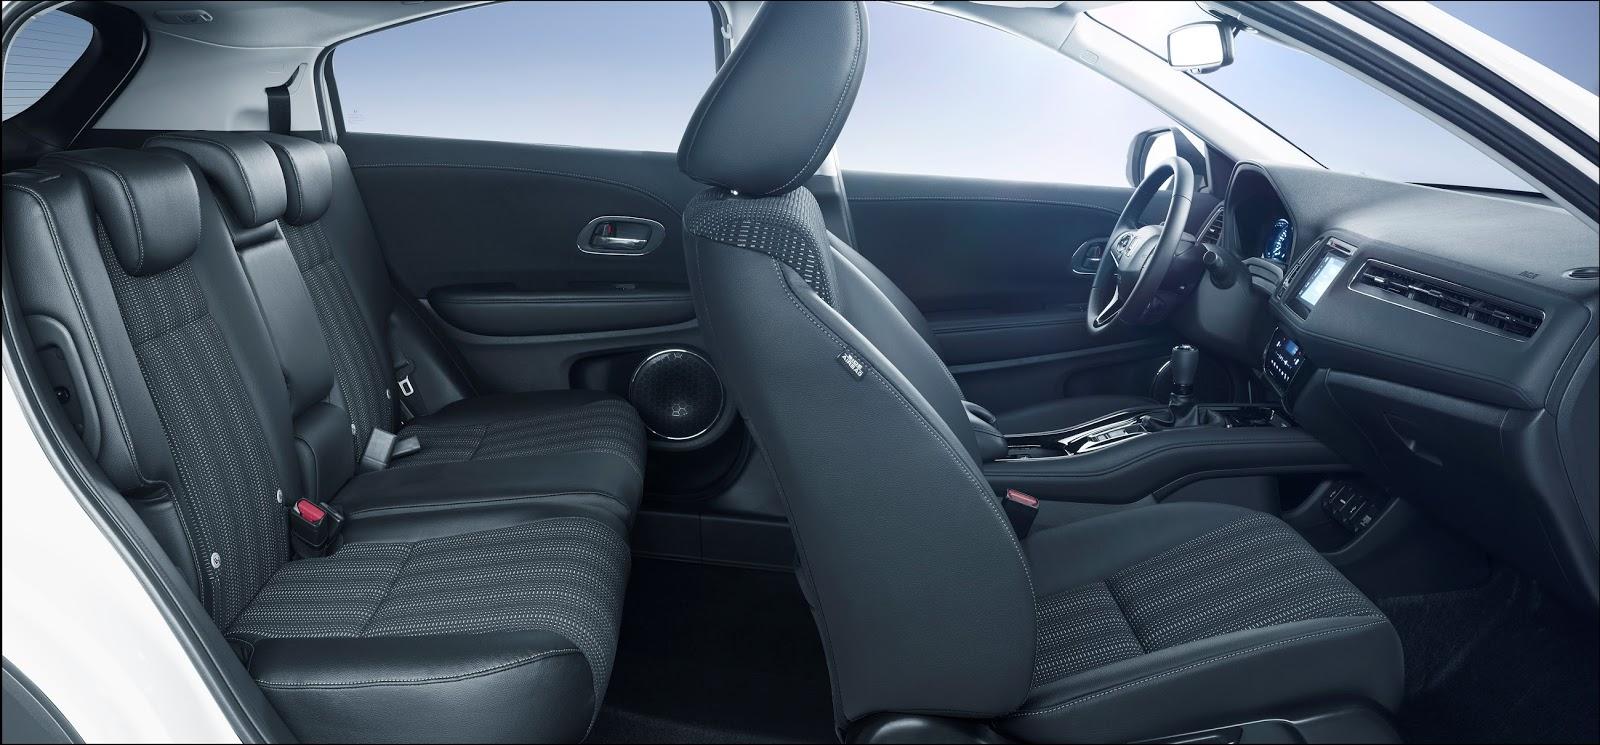 40668 2015 Honda HR V Νέο Honda HR-V : Το πολυμορφικό SUV